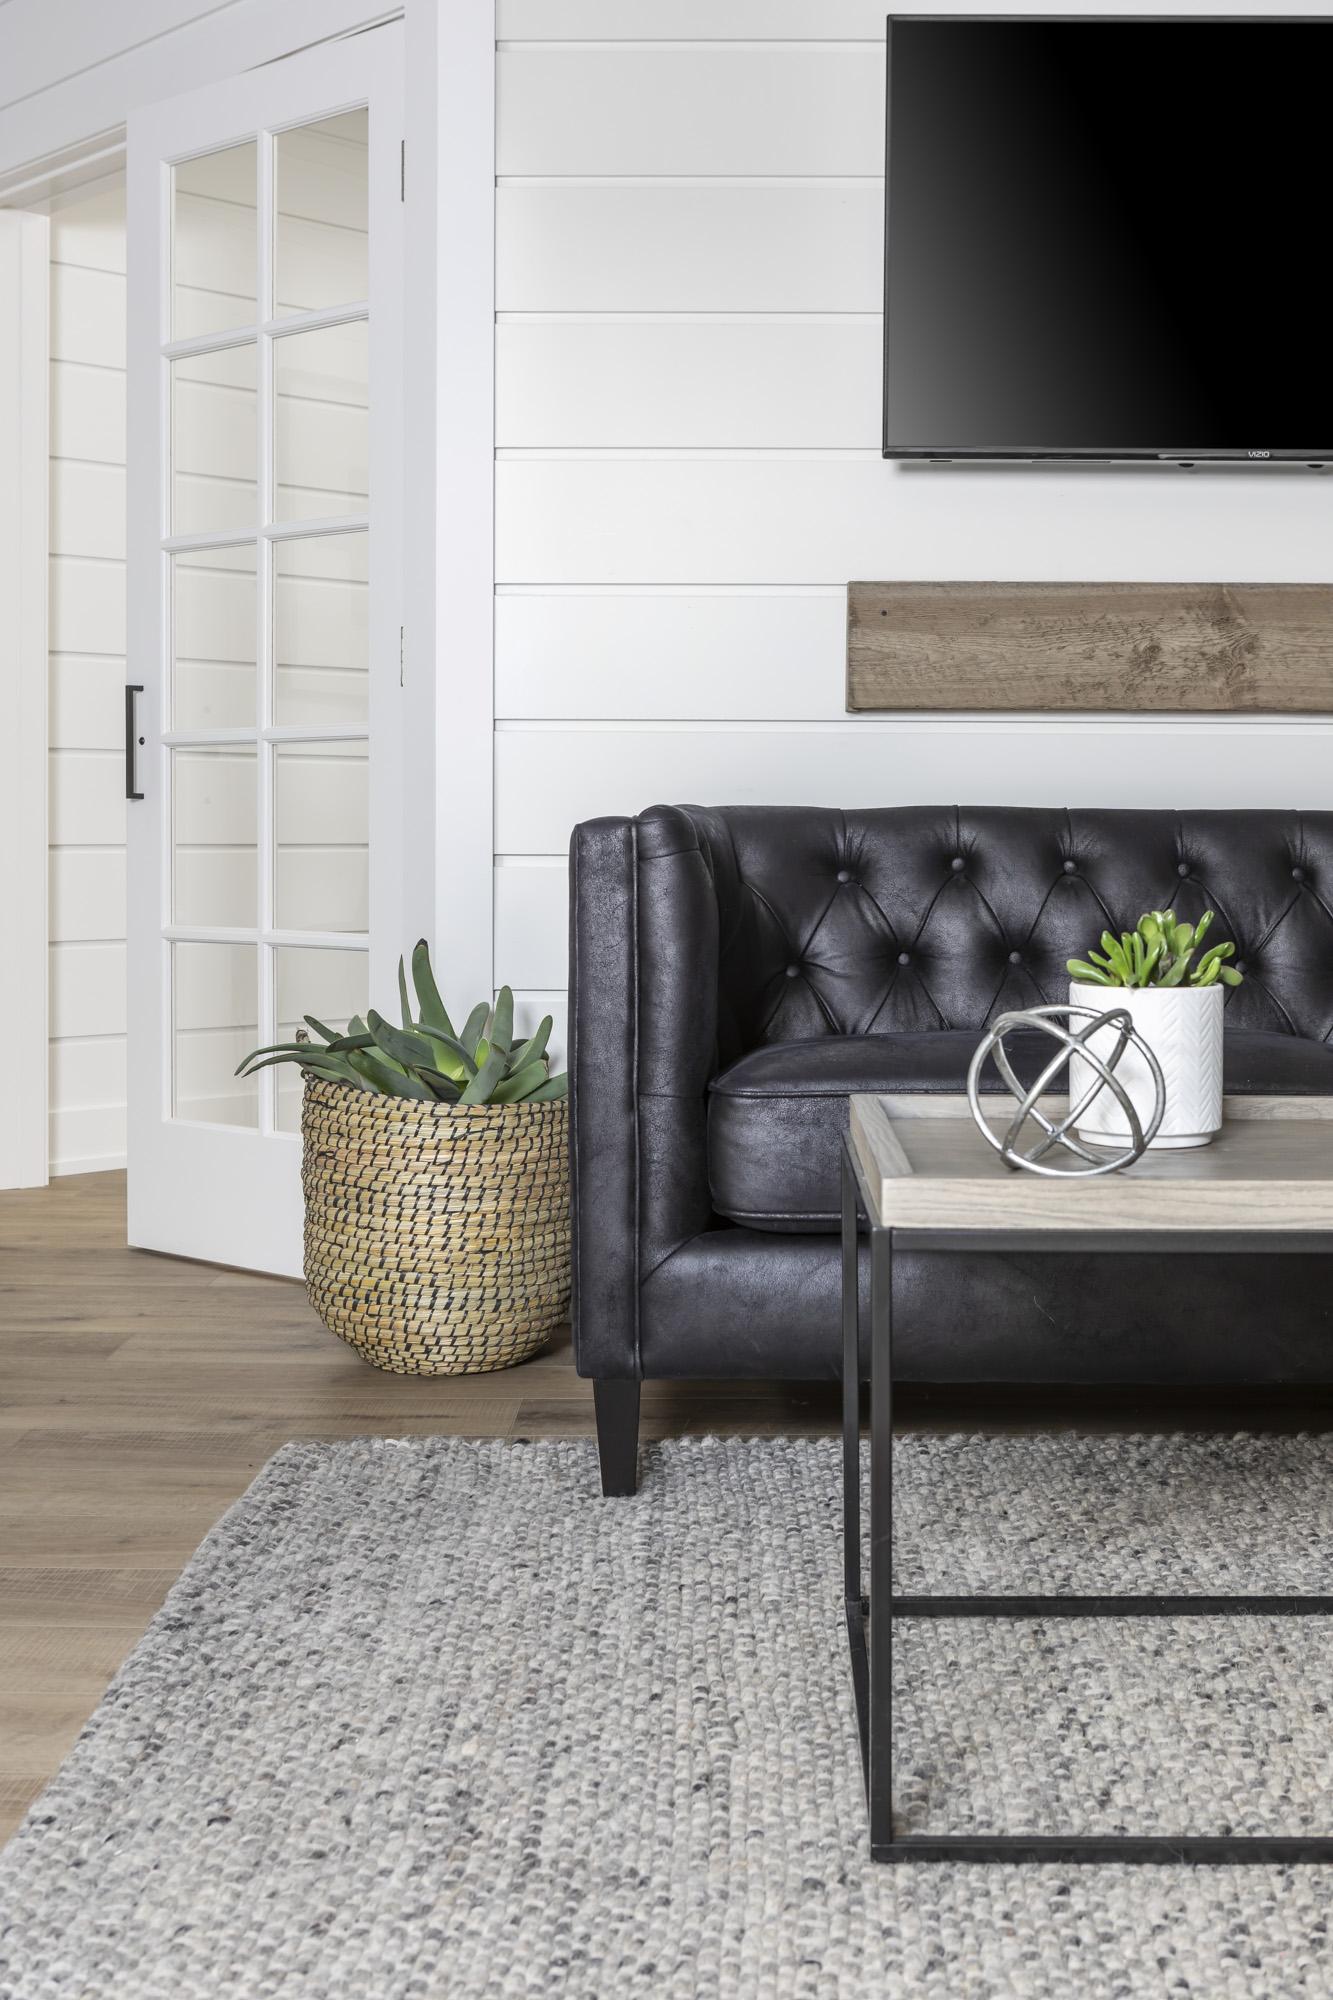 Office Loft - La casa azul deisgn